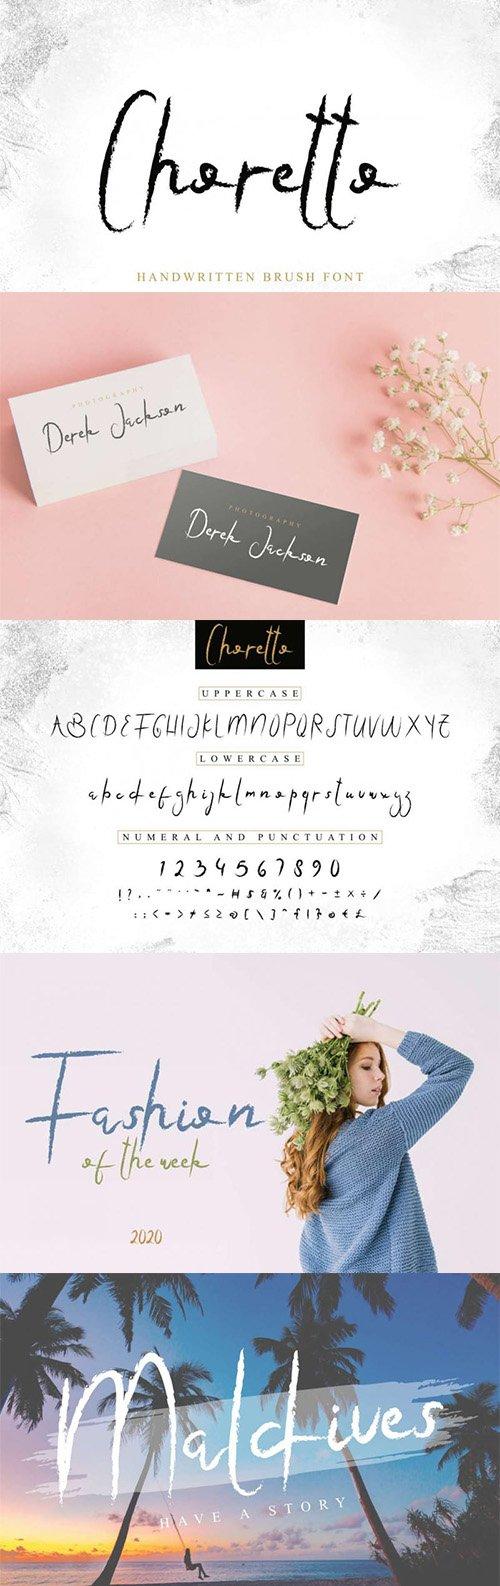 Choretto Handwritten Brush Script Font